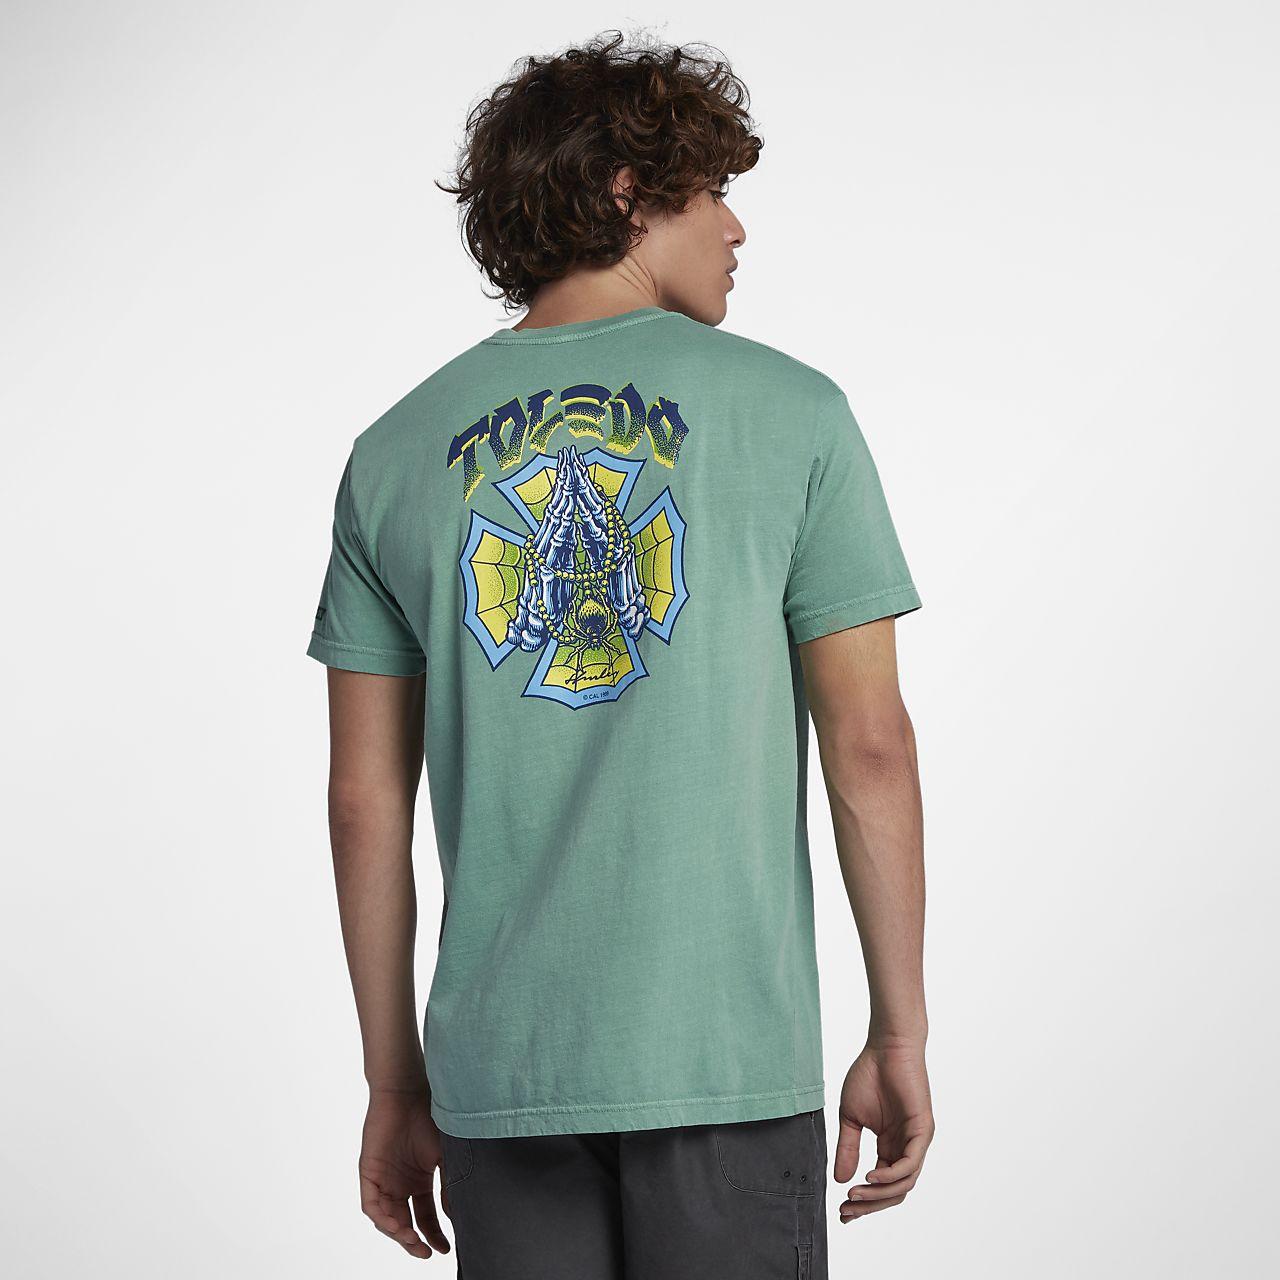 T-shirt Hurley Team Toledo - Uomo